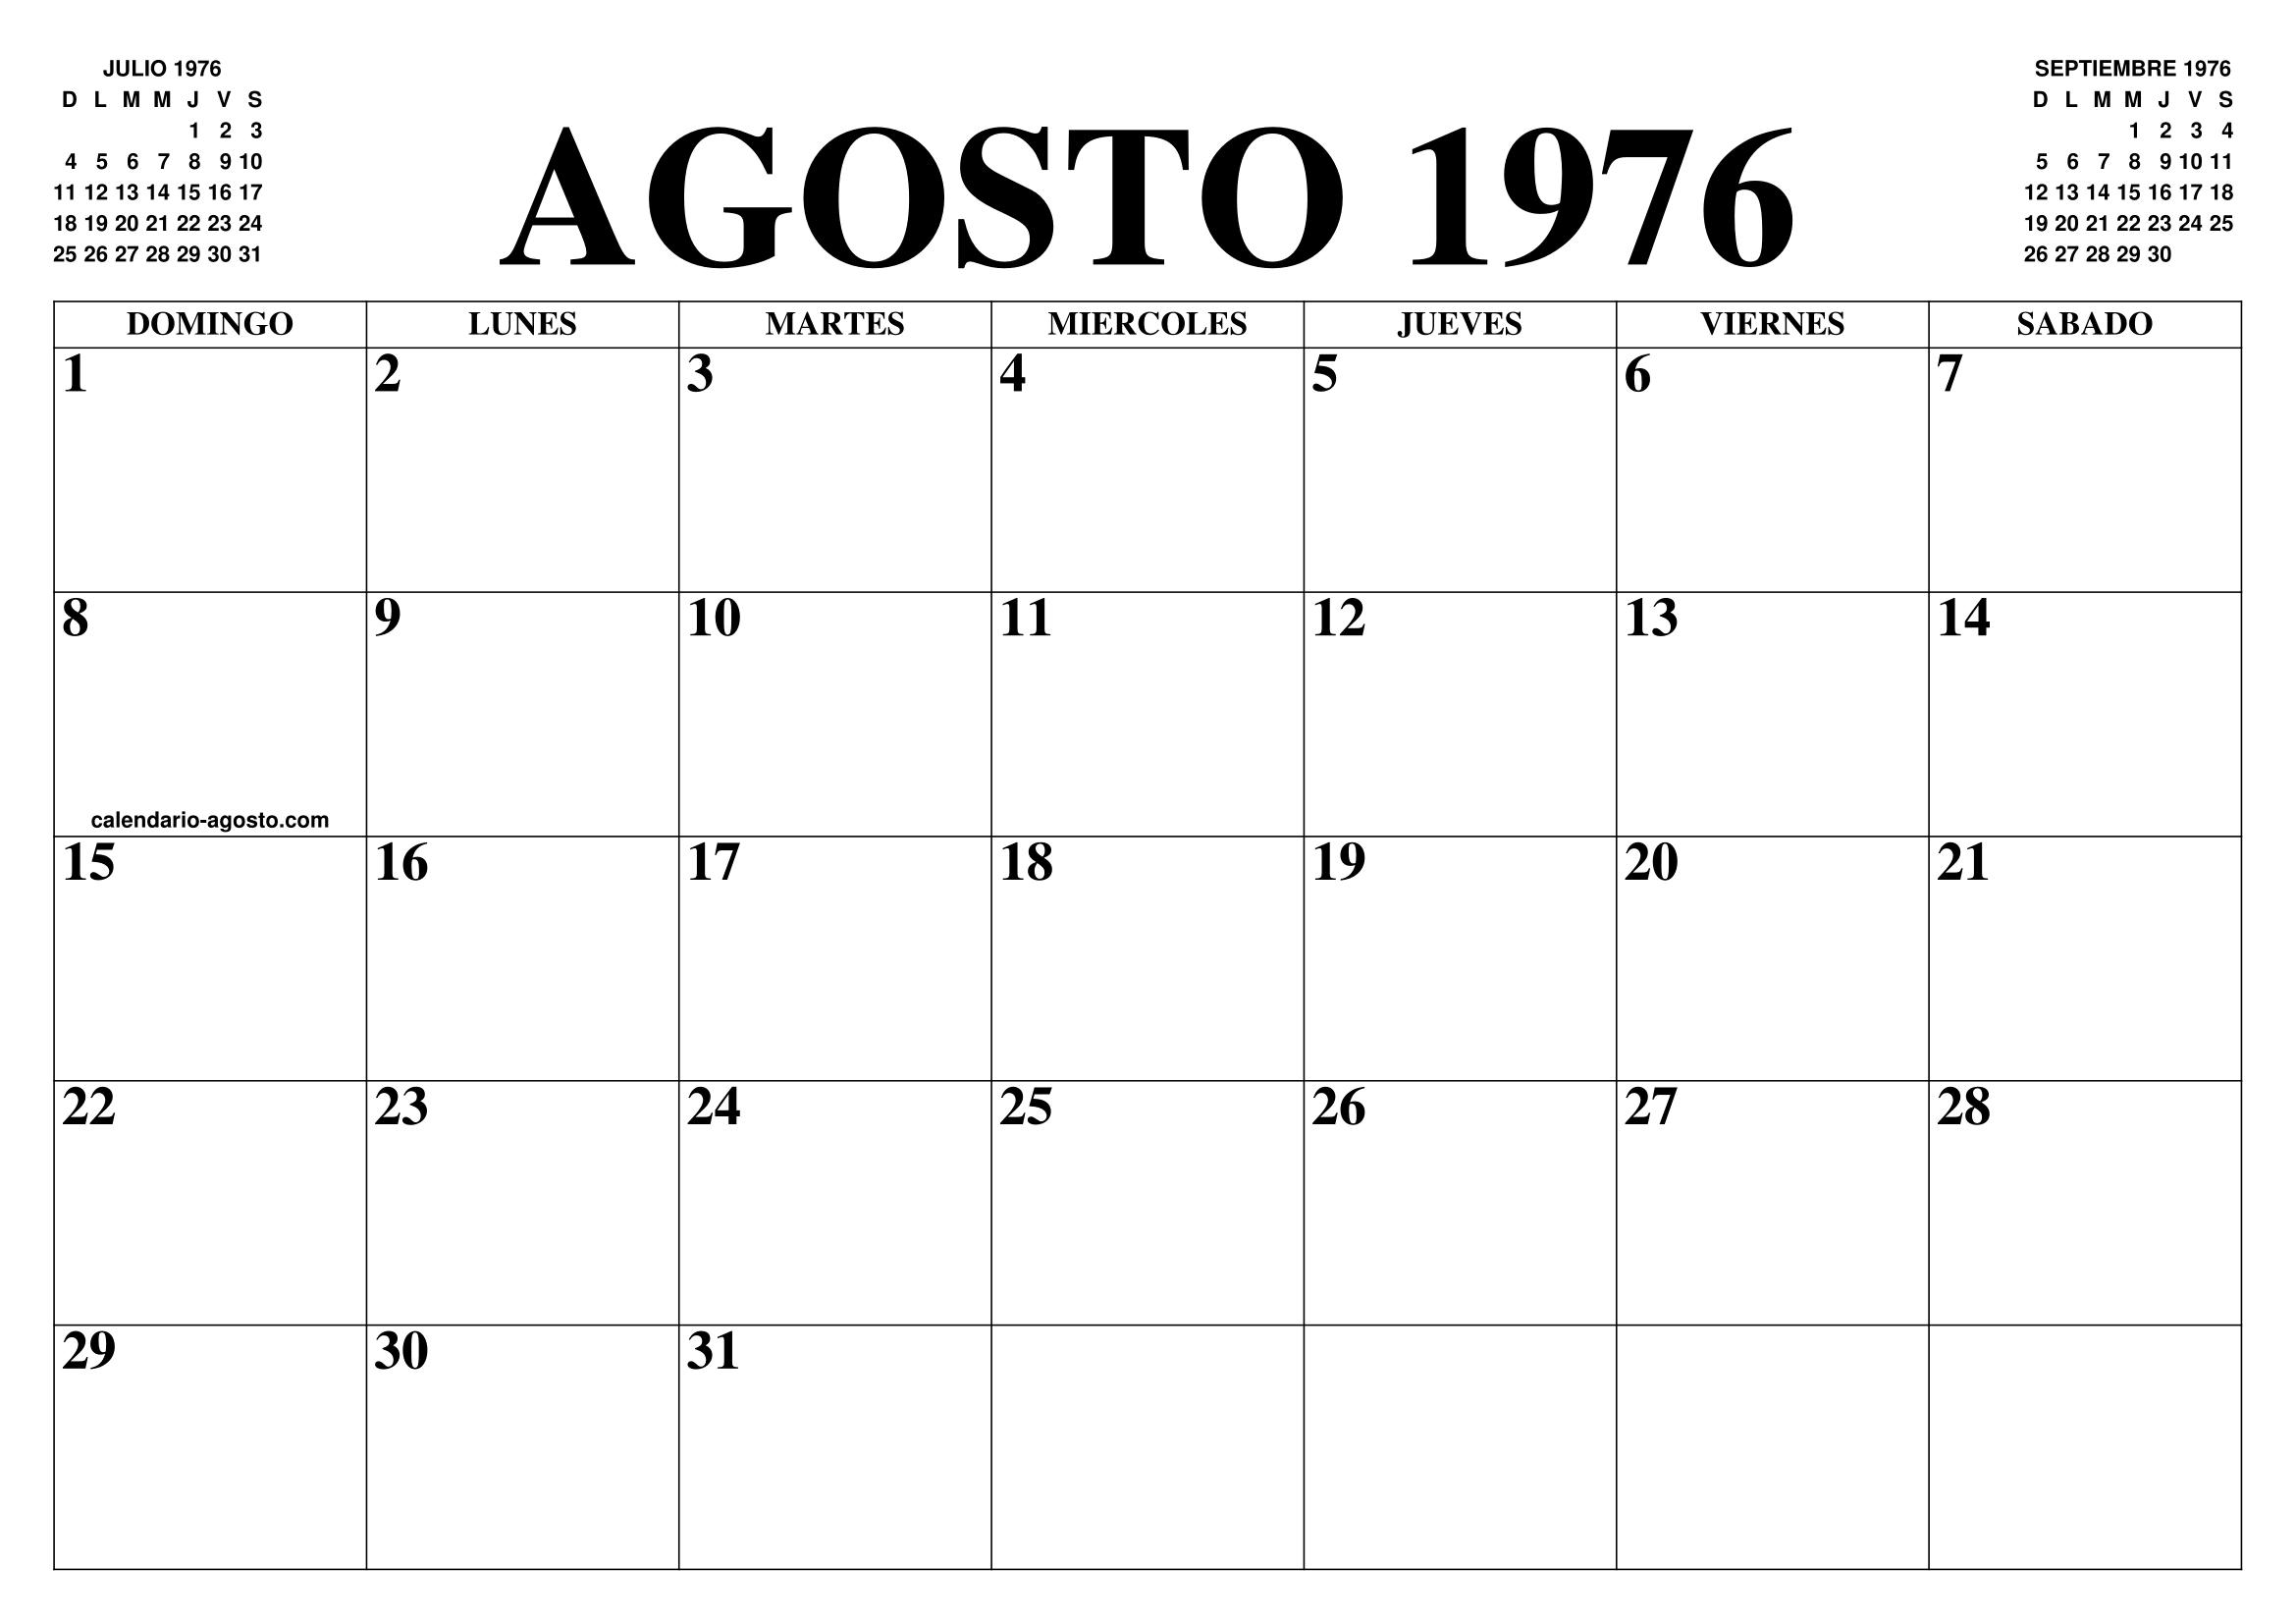 Calendario Julio 1976.Calendario Agosto 1976 El Calendario Agosto Para Imprimir